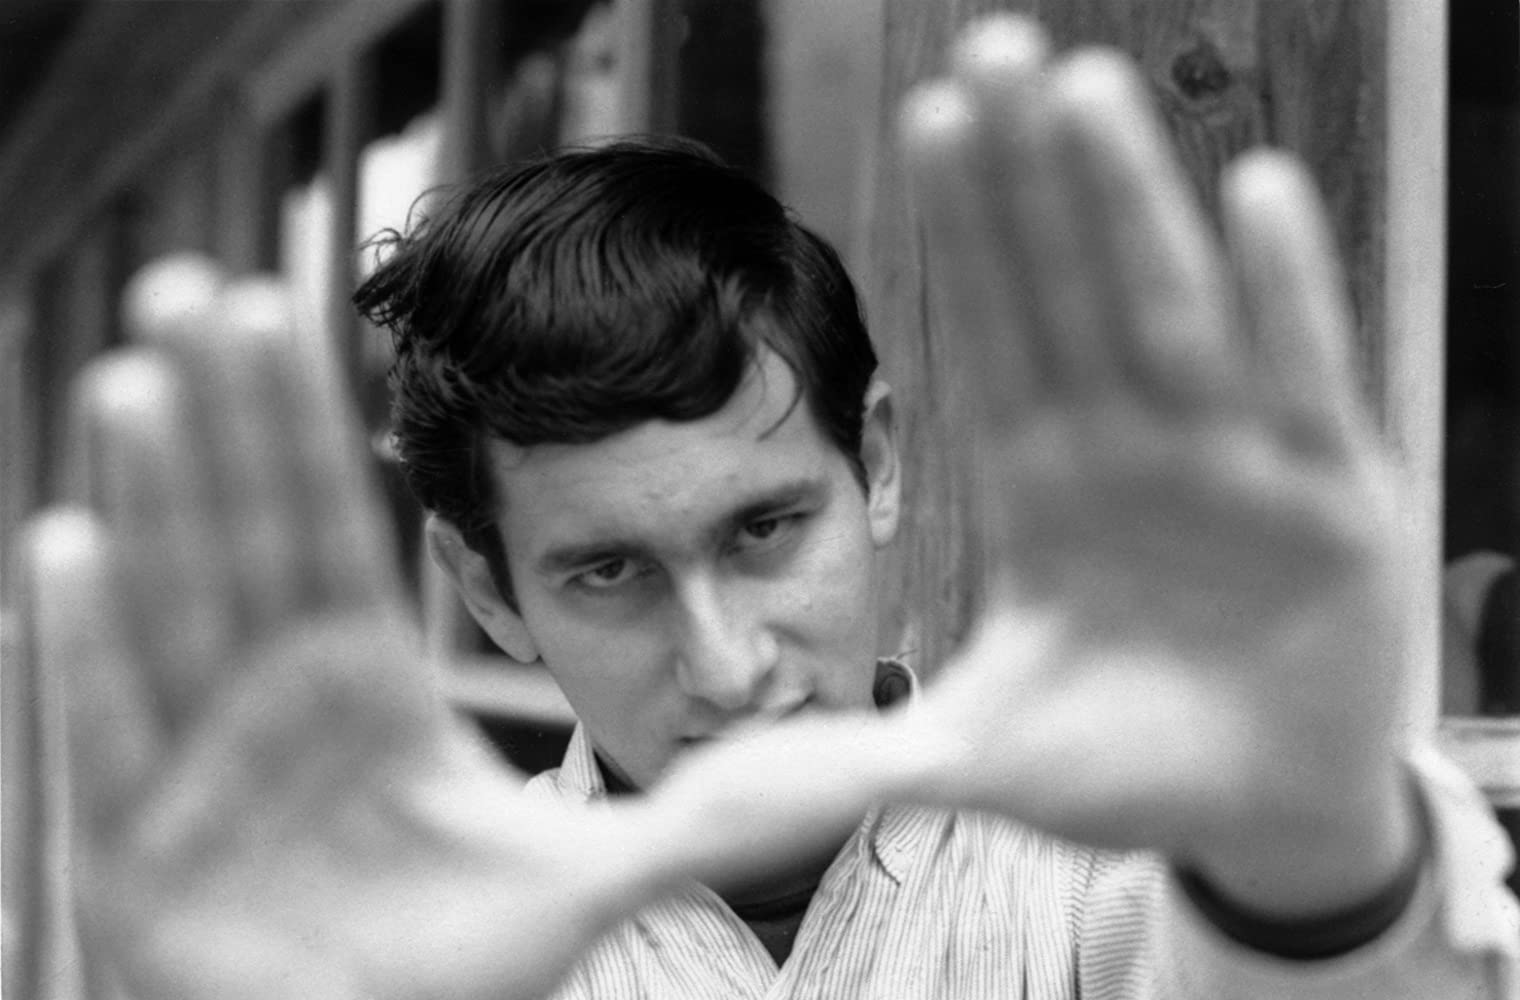 Steven Spielberg in Duel 1971